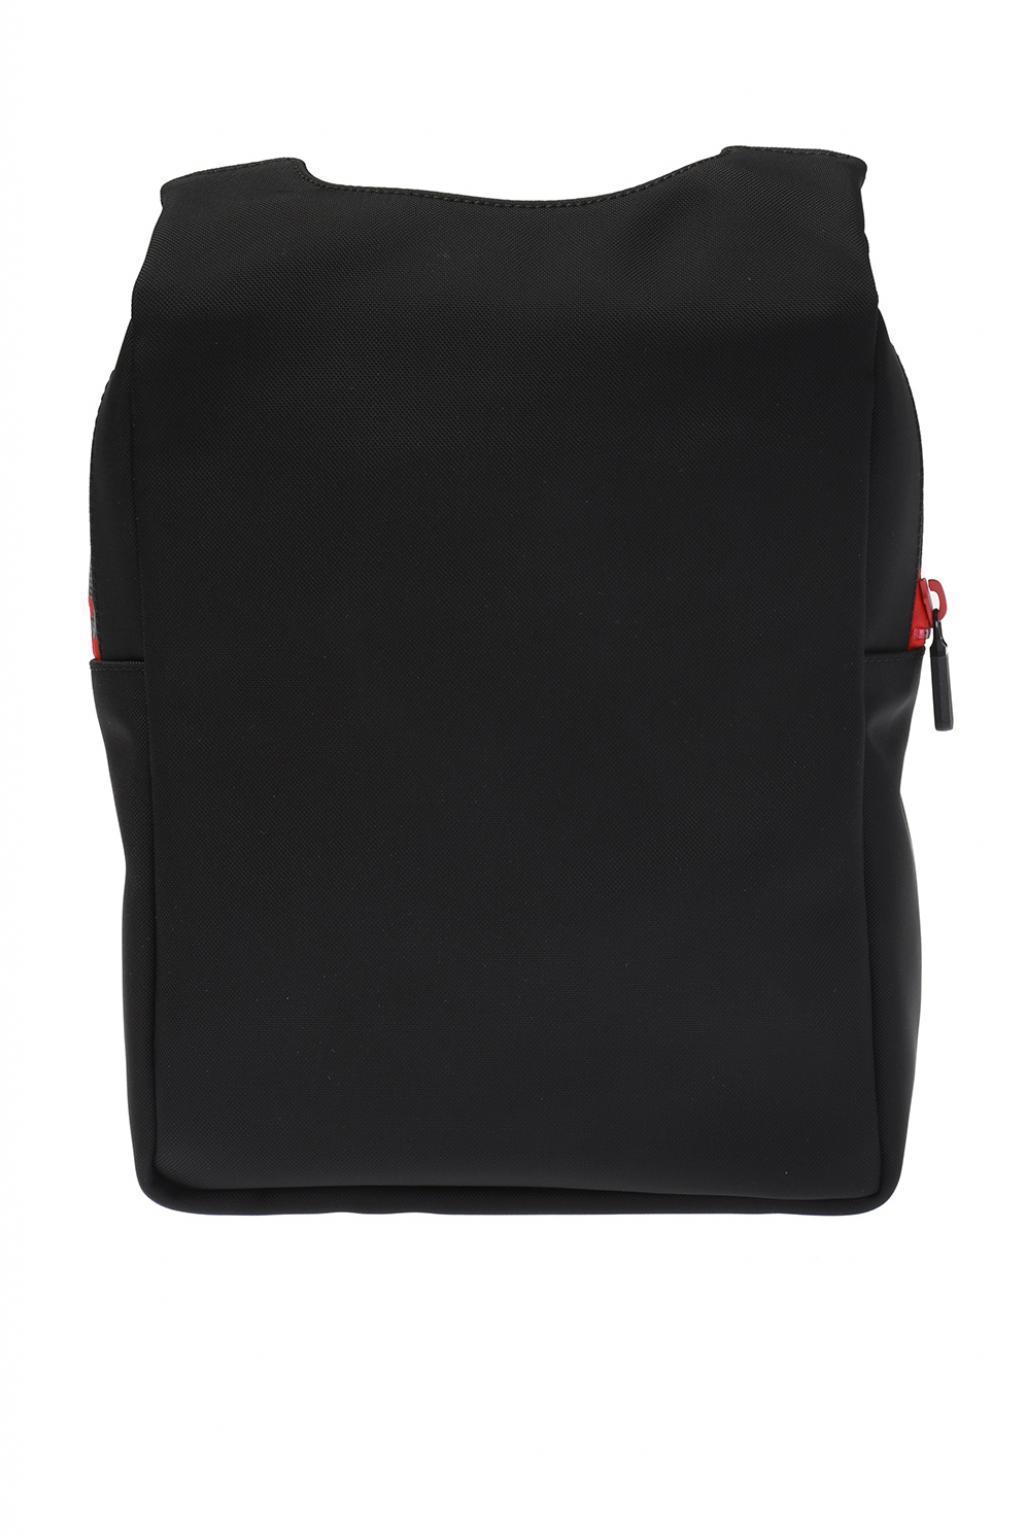 f0efbb2da27 Moncler - Black  pascal  Shoulder Bag for Men - Lyst. View fullscreen